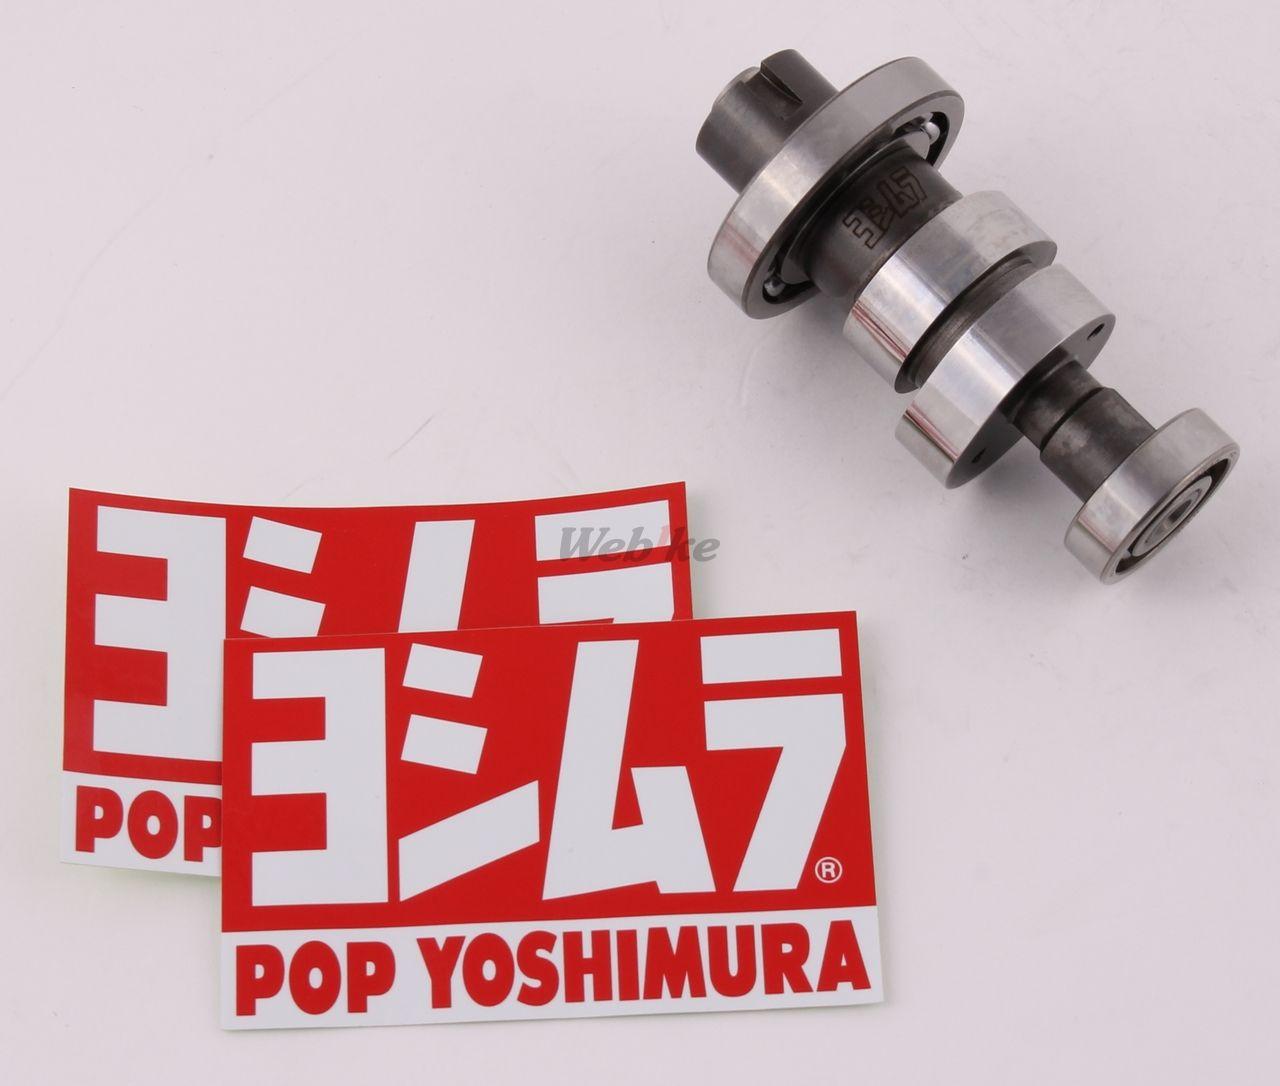 【YOSHIMURA】凸輪軸 【ST-1M】 - 「Webike-摩托百貨」